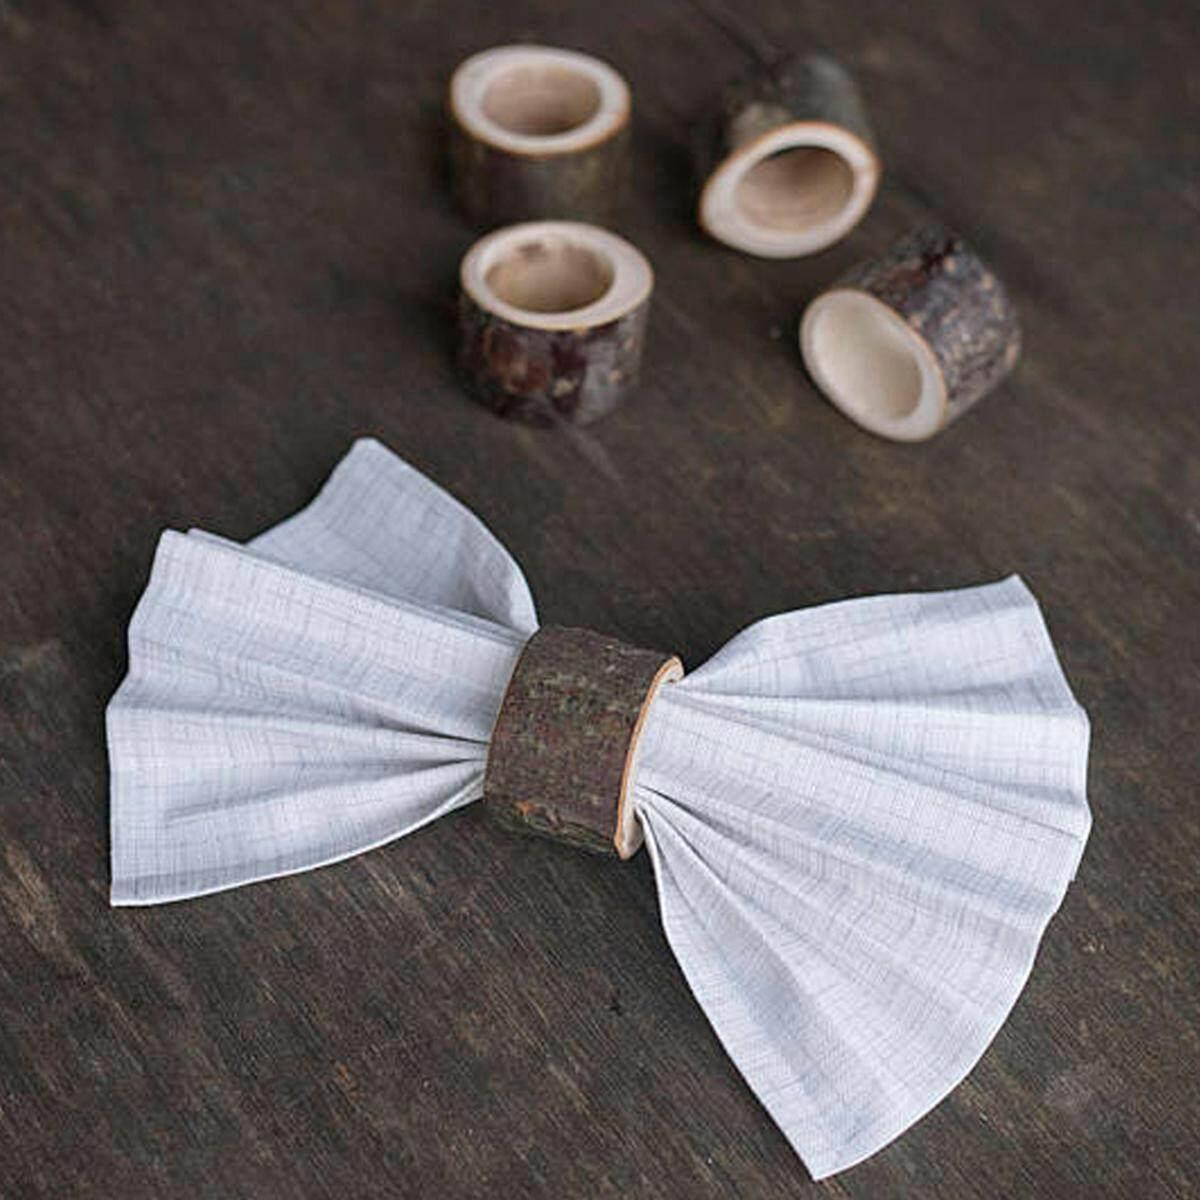 leegoal Rustic Wood napkin ring, Wedding Napkin Holder For Table Decor